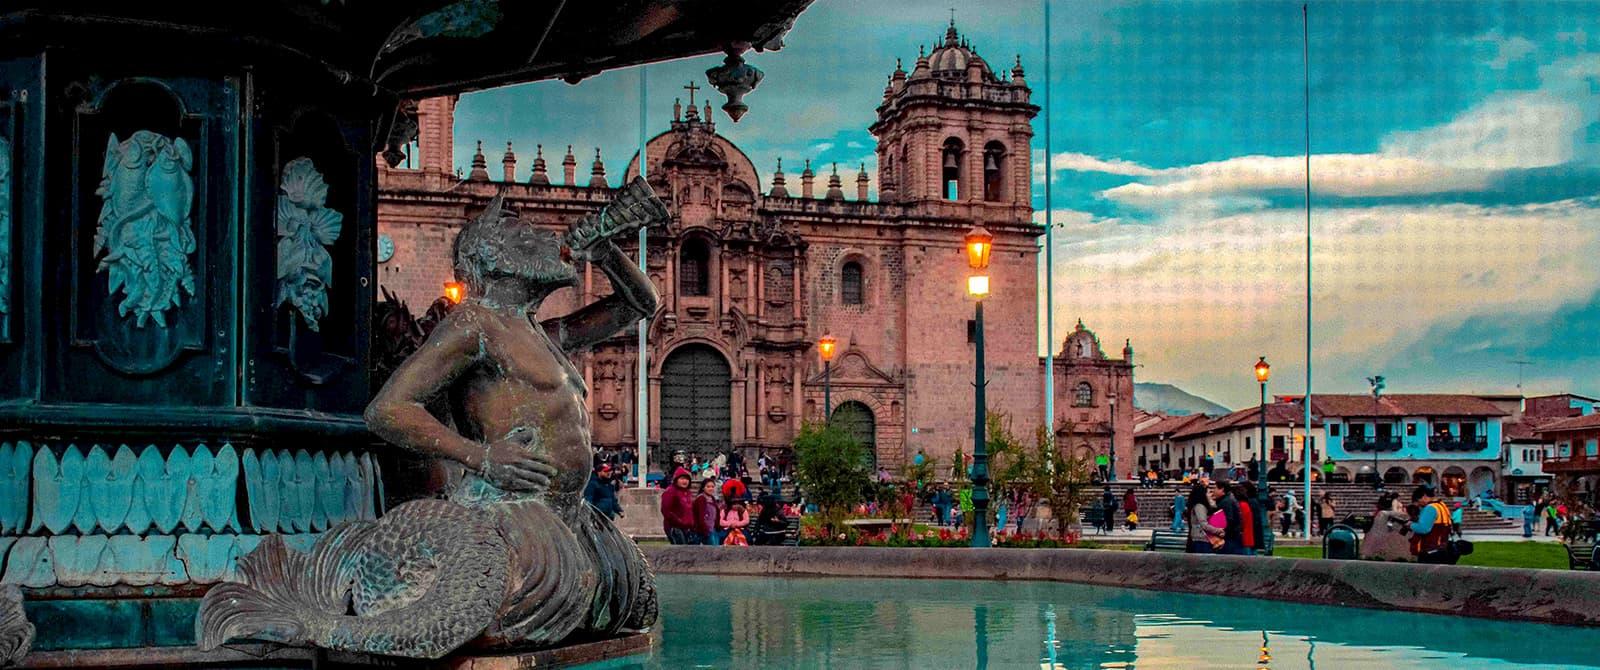 cusco the main square